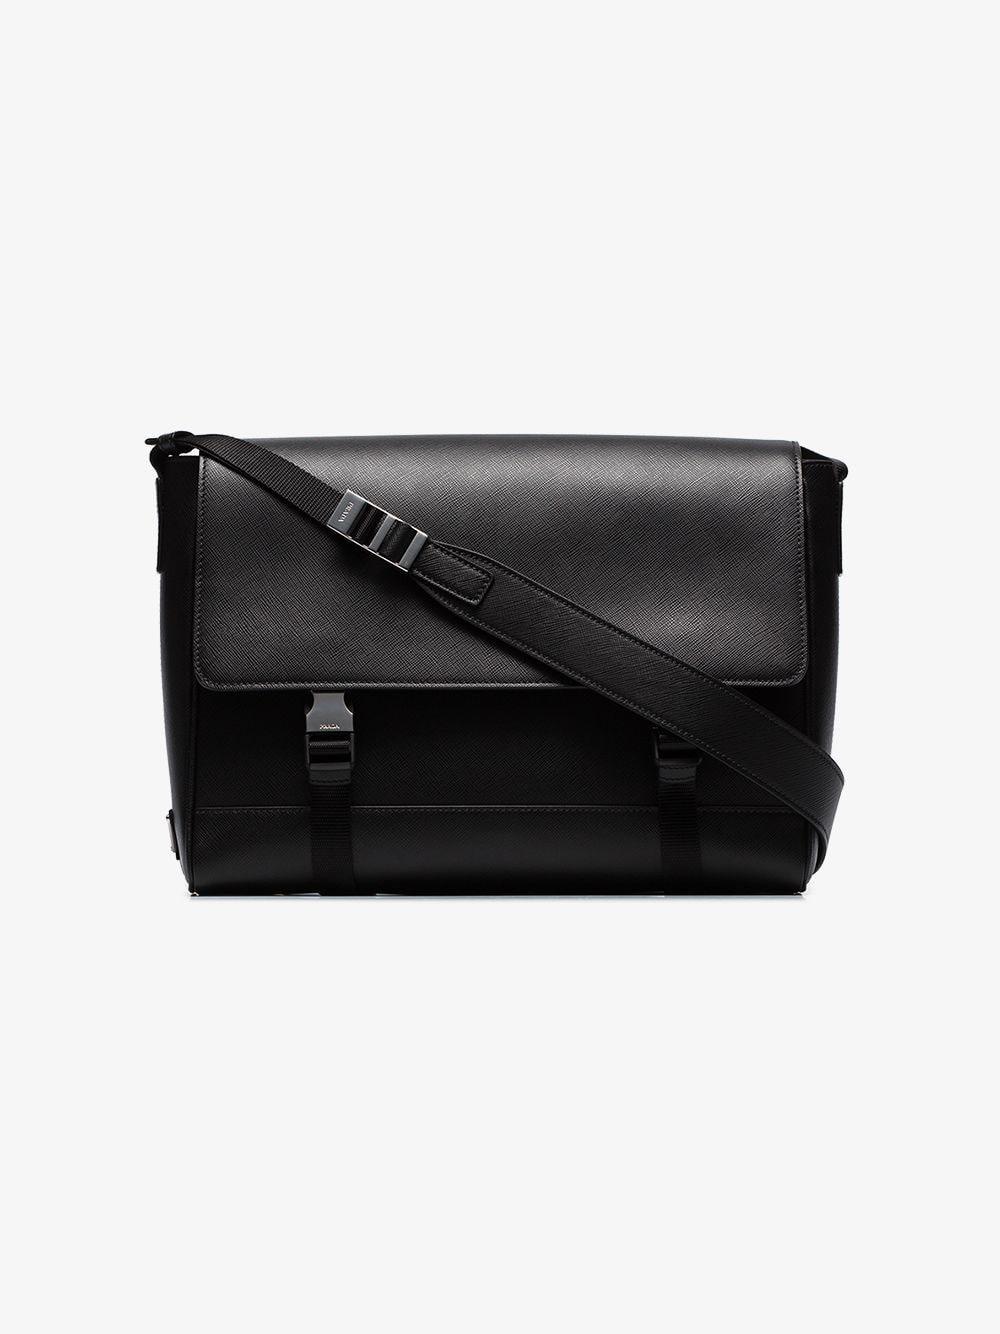 38f2b09829 Lyst - Prada Saffiano Leather Shoulder Bag in Black for Men